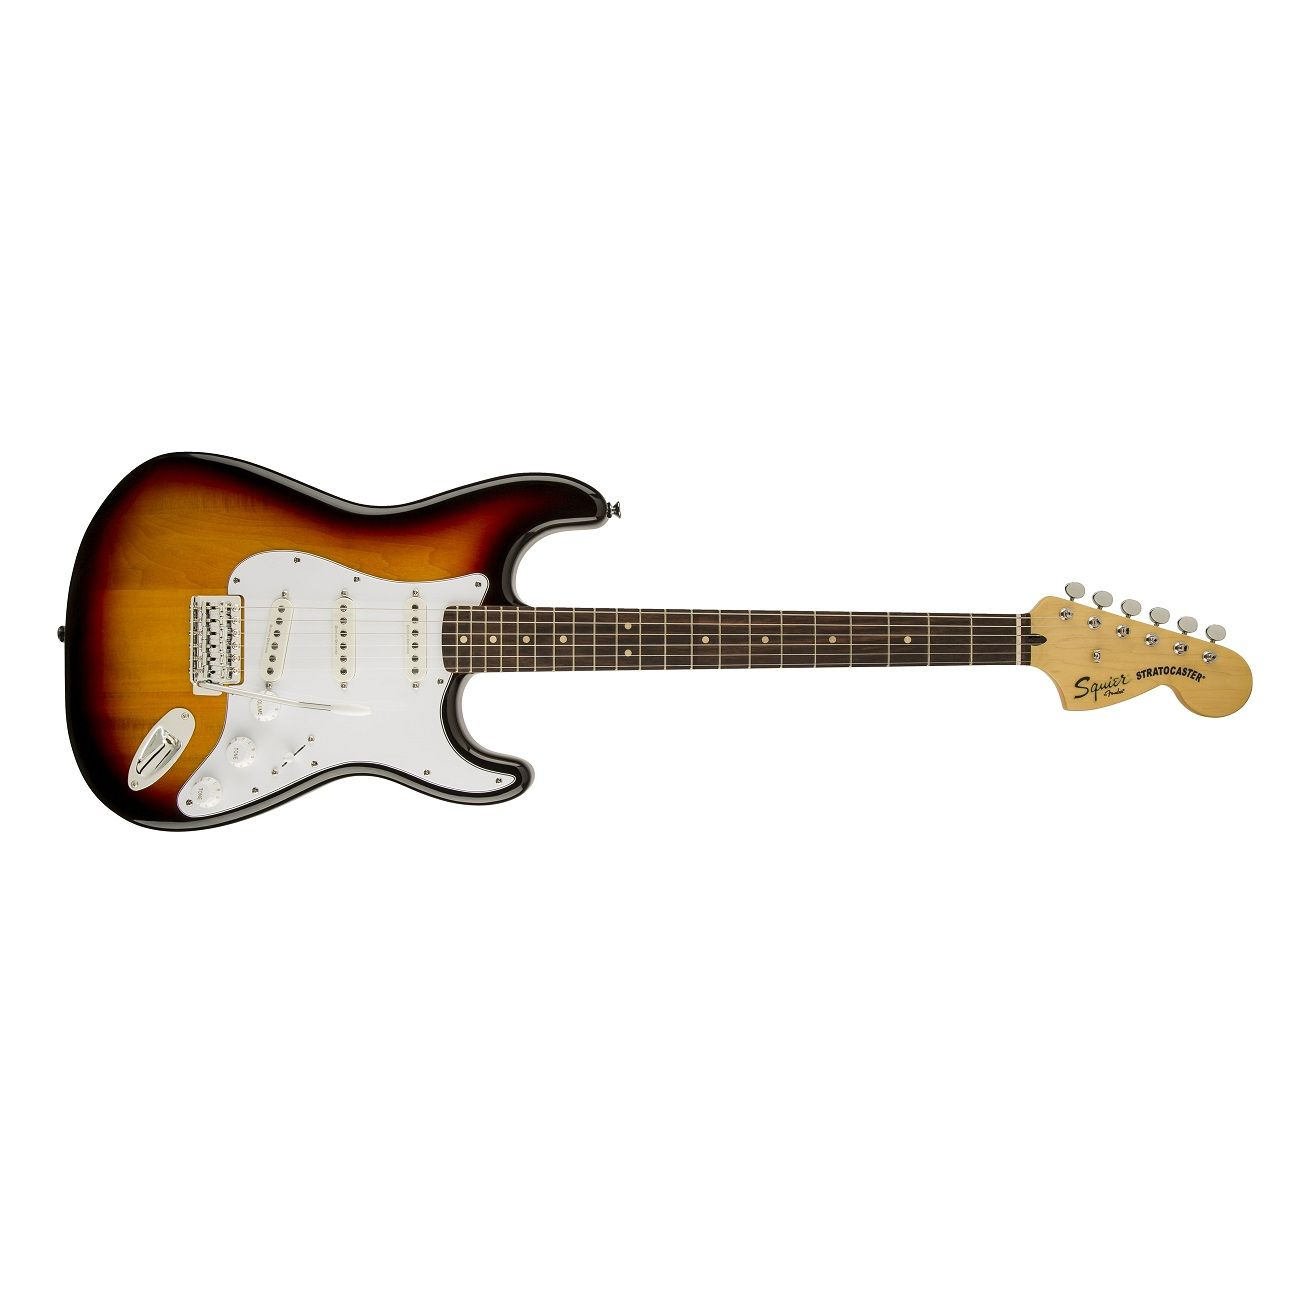 Fender Squier by Vintage Modified Stratocaster Beginner Electric Guitar 3 Color Sunburst